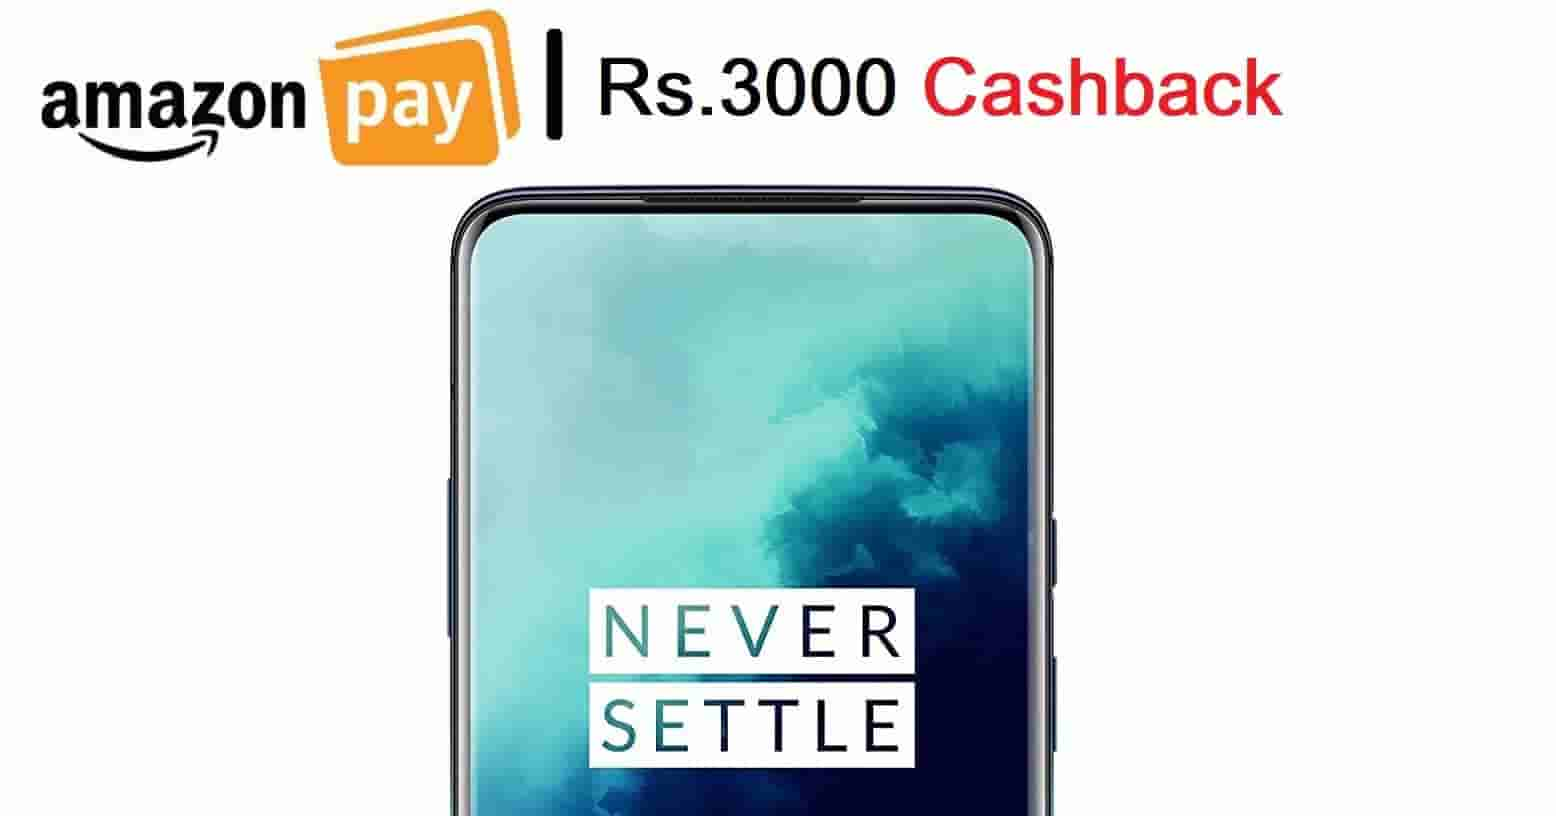 OnePlus 7T/PRO – Flat Rs.3000 Cashback